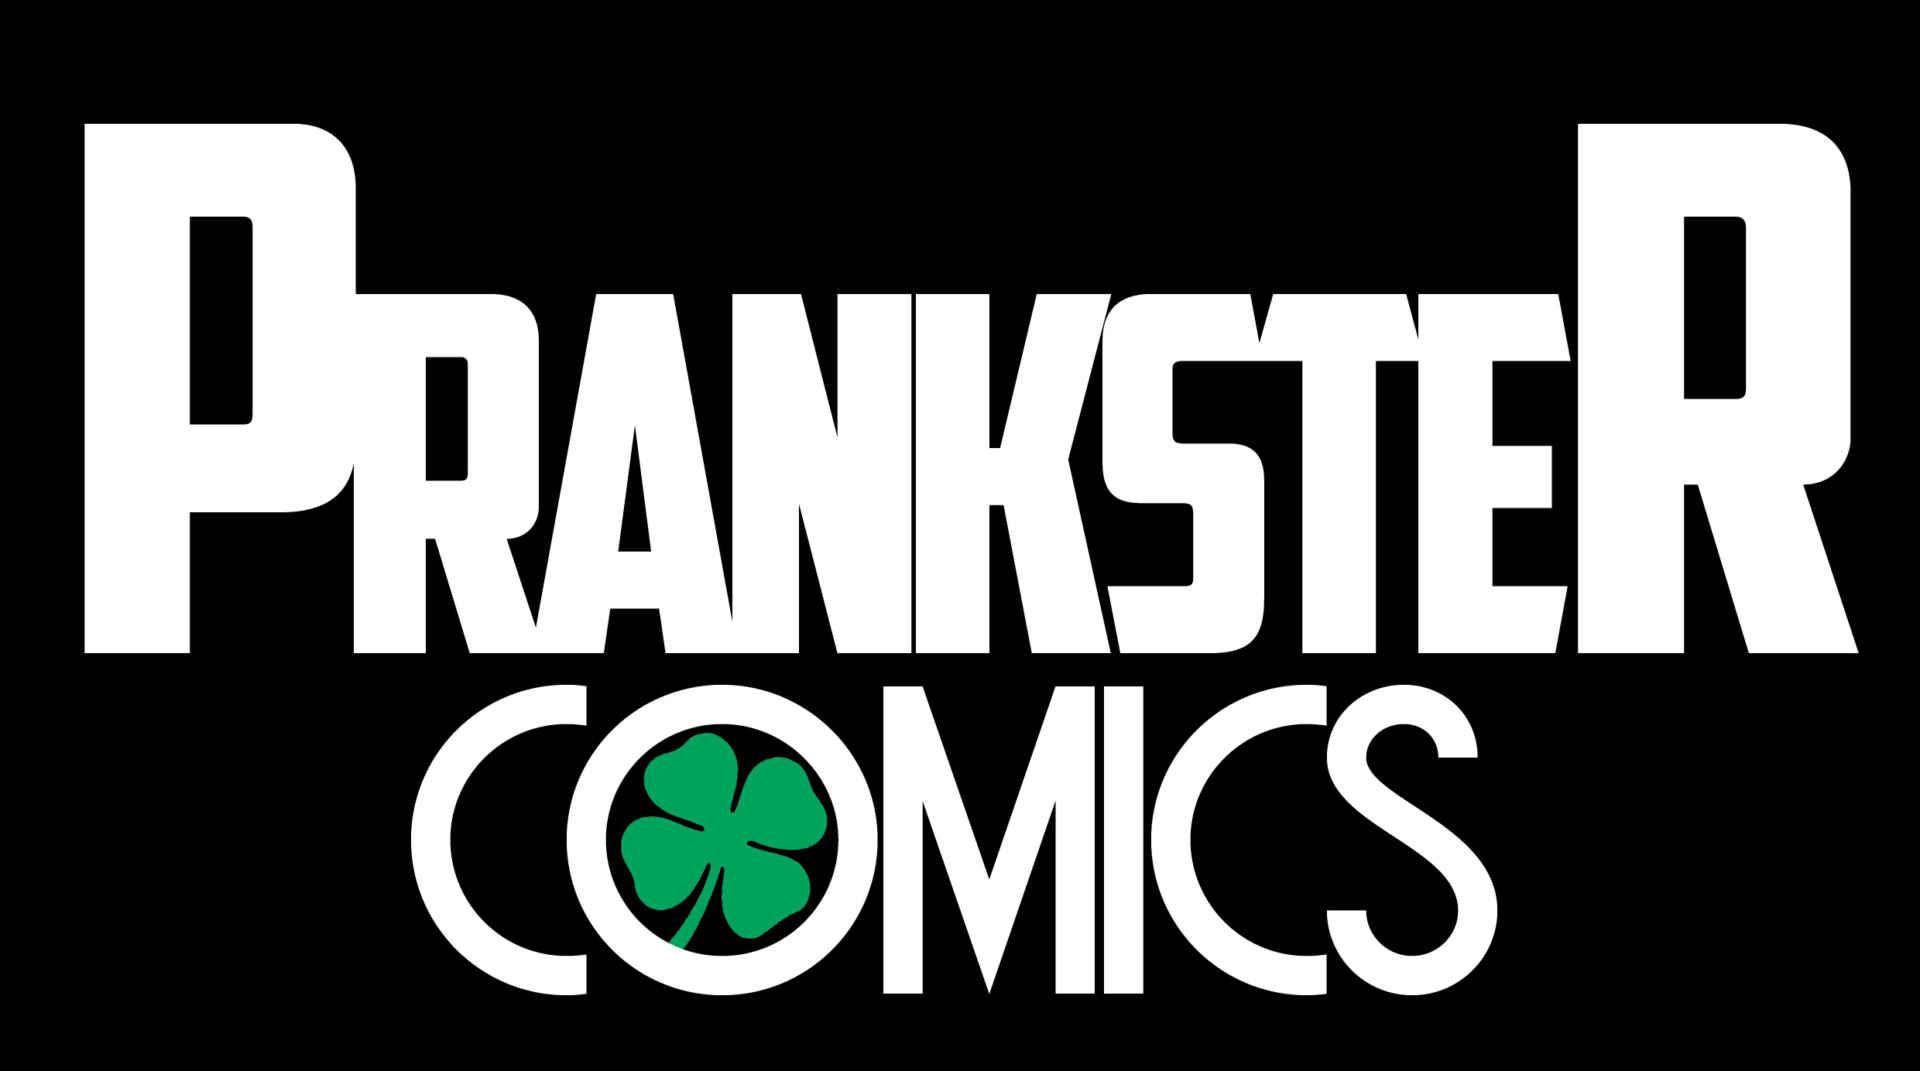 Prankster Comics